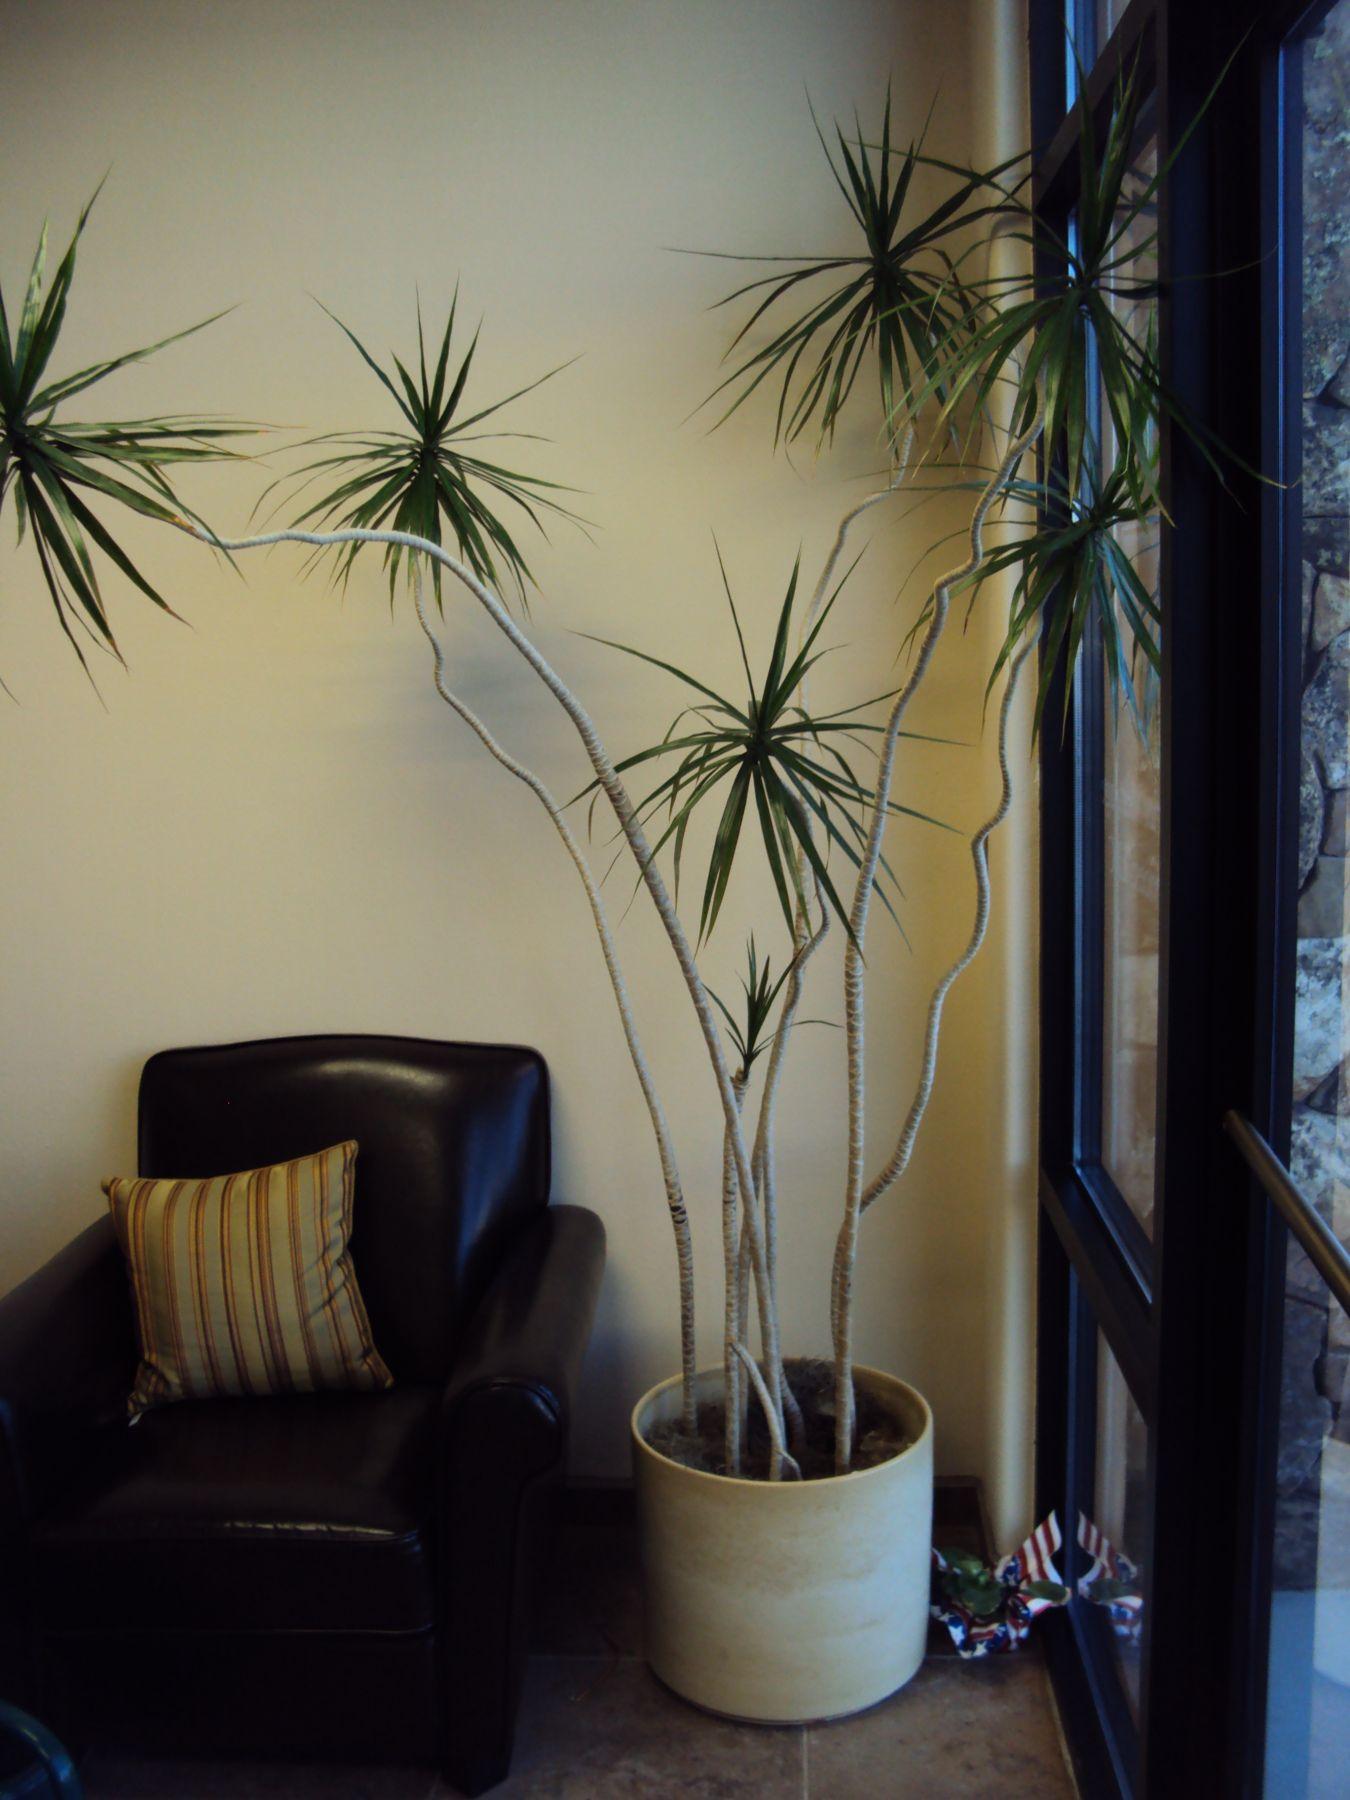 Dracaena marginata indoor garden pinterest plante interieur plantes et plantes vertes - Entretien dracaena marginata ...